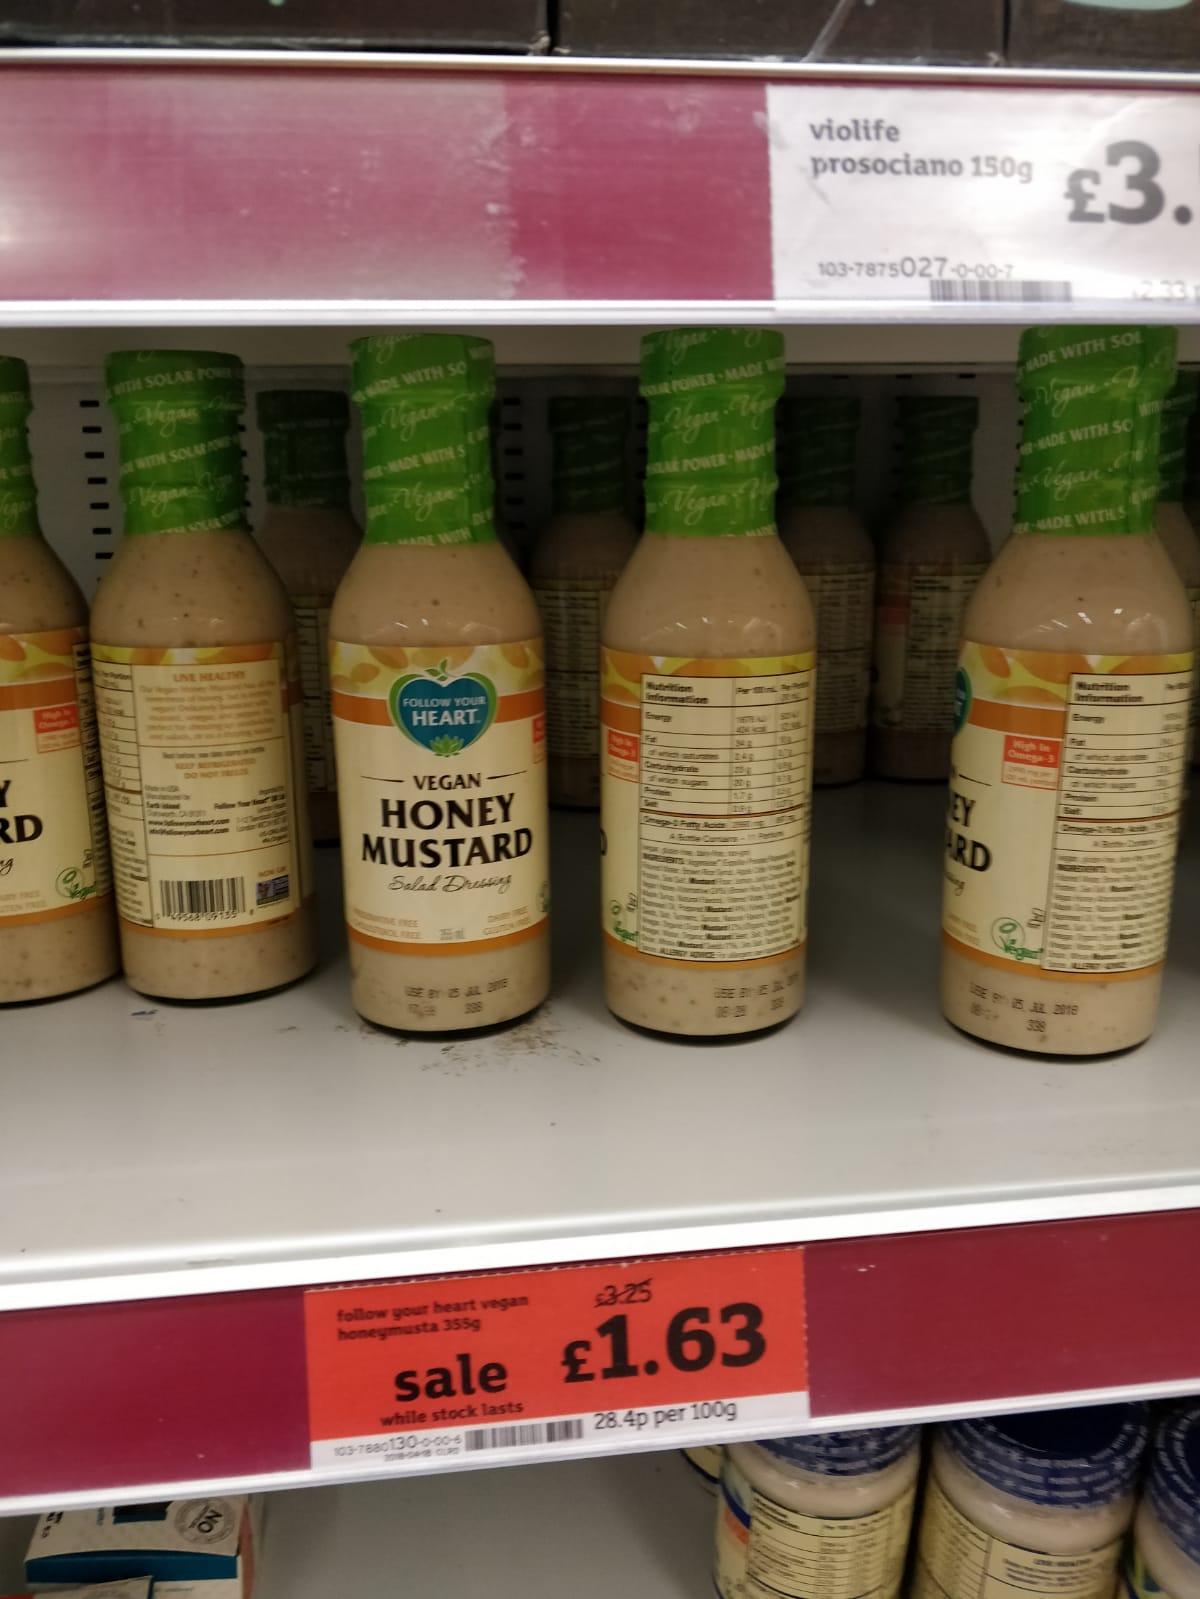 Vegan Honey Mustard - Follow Your Heart - Pricing Error 50p at Sainsburys instore